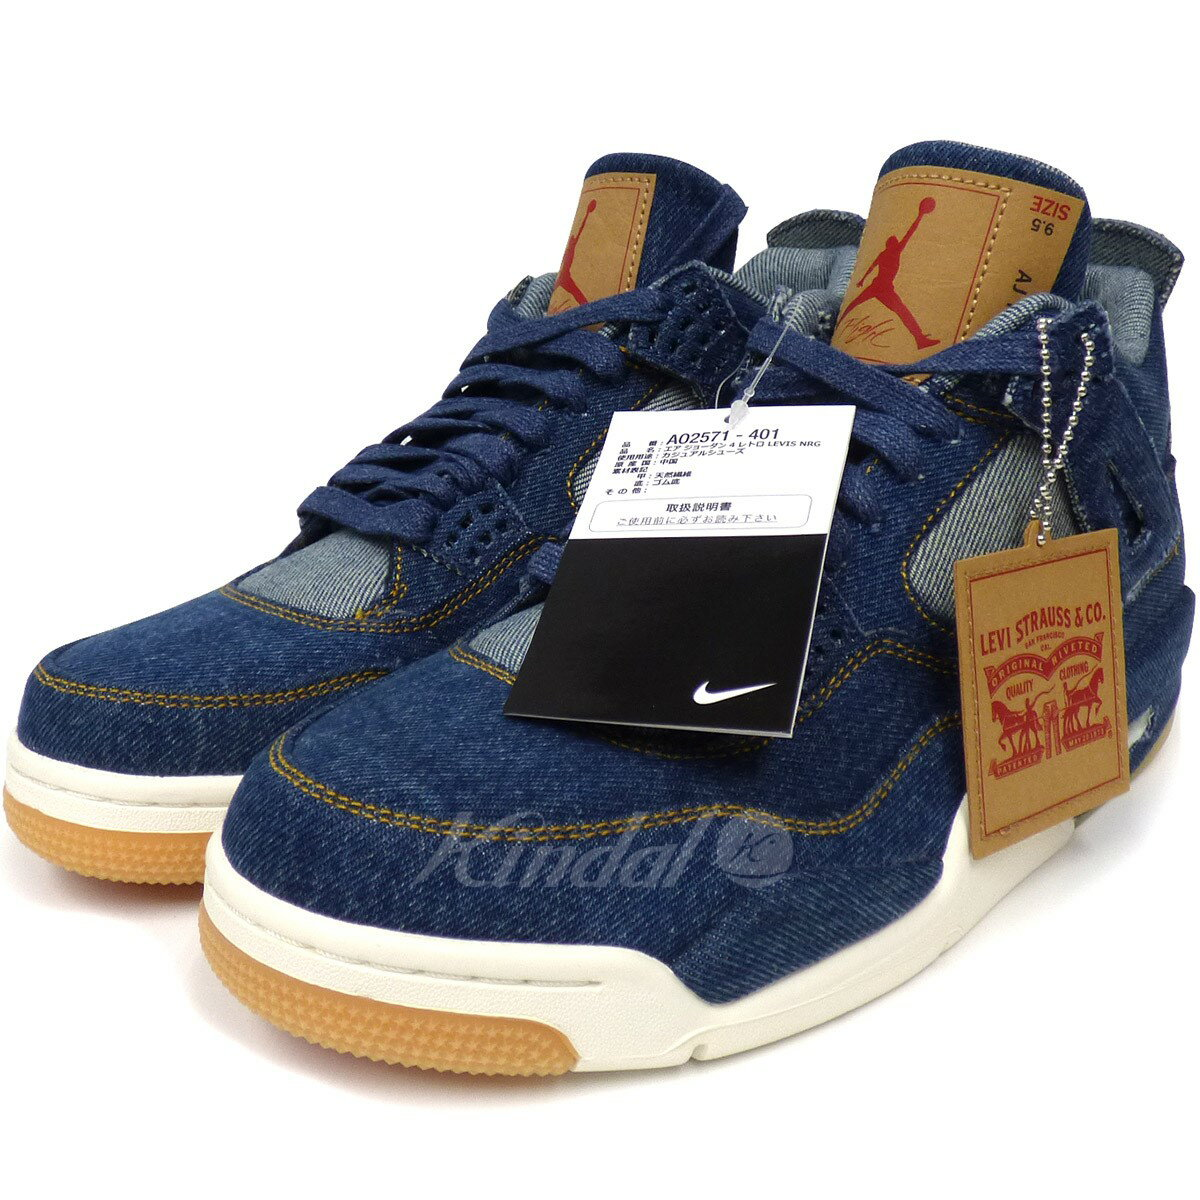 reputable site c7bc1 abac4 NIKE X LEVI' S AIR JORDAN 4 RETRO LEVIS NRG Air Jordan 4 sneakers indigo  size: US9. 5 (27.5cm) (Nike Levis)